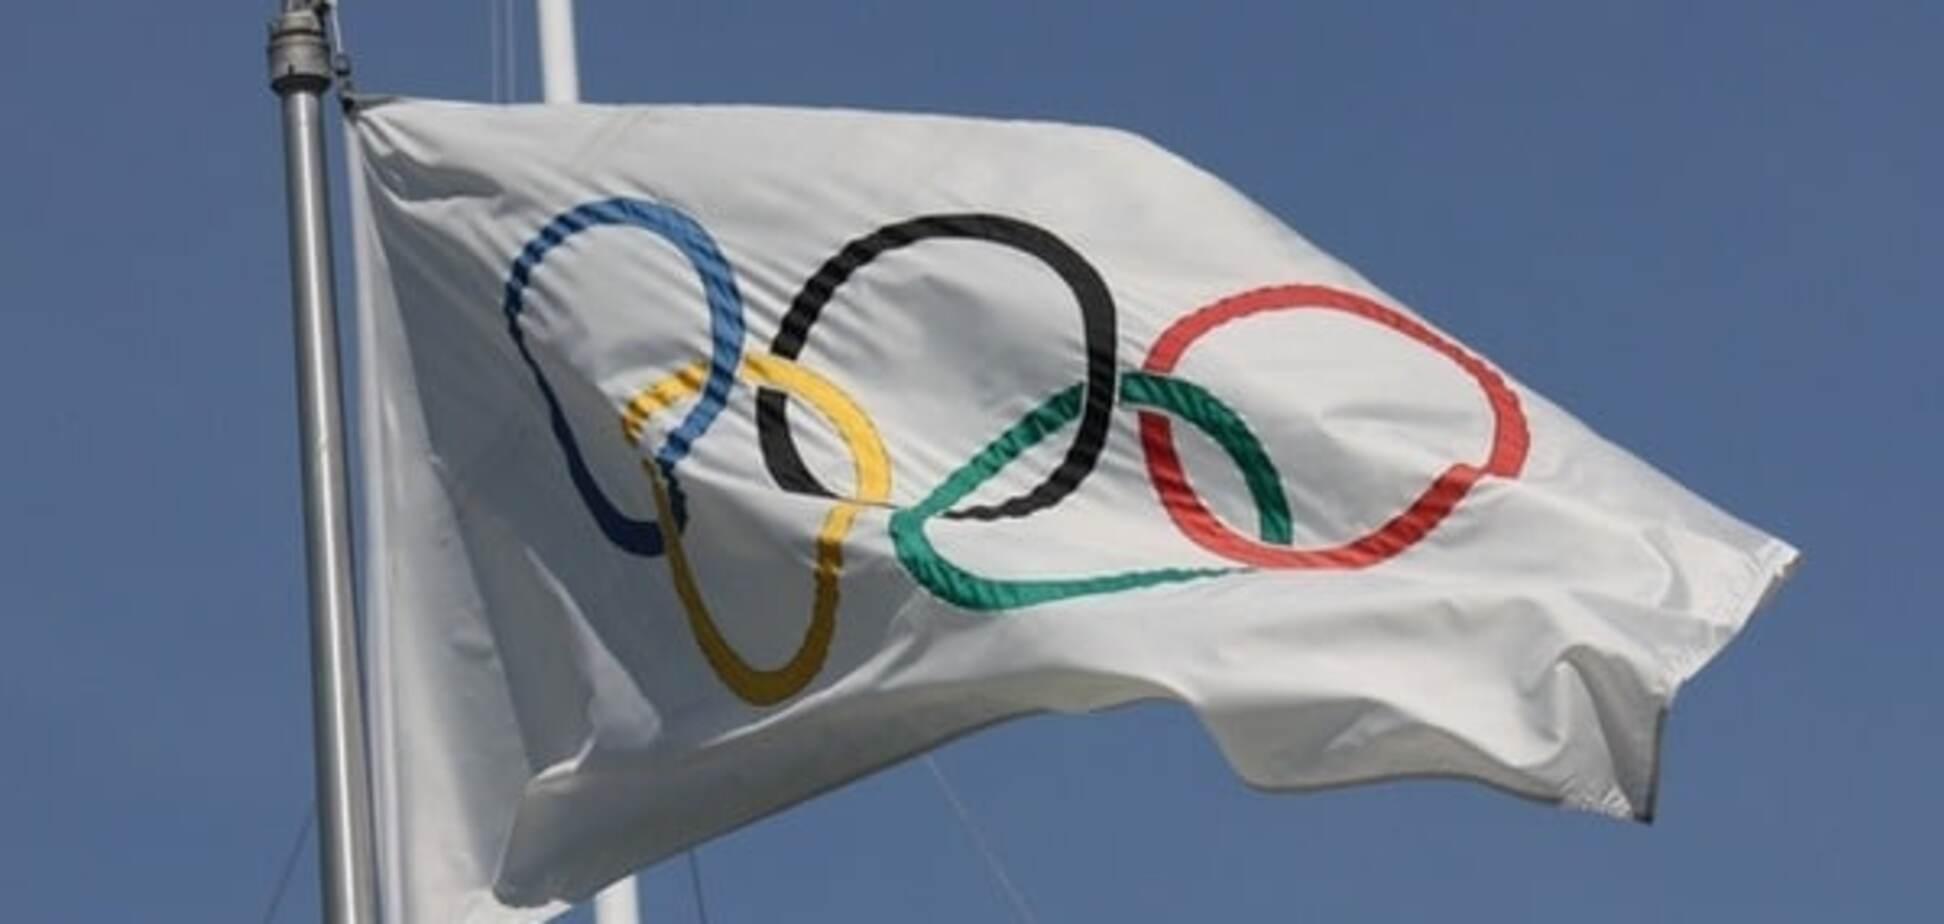 Олимпиада-2016: медали из электроприборов